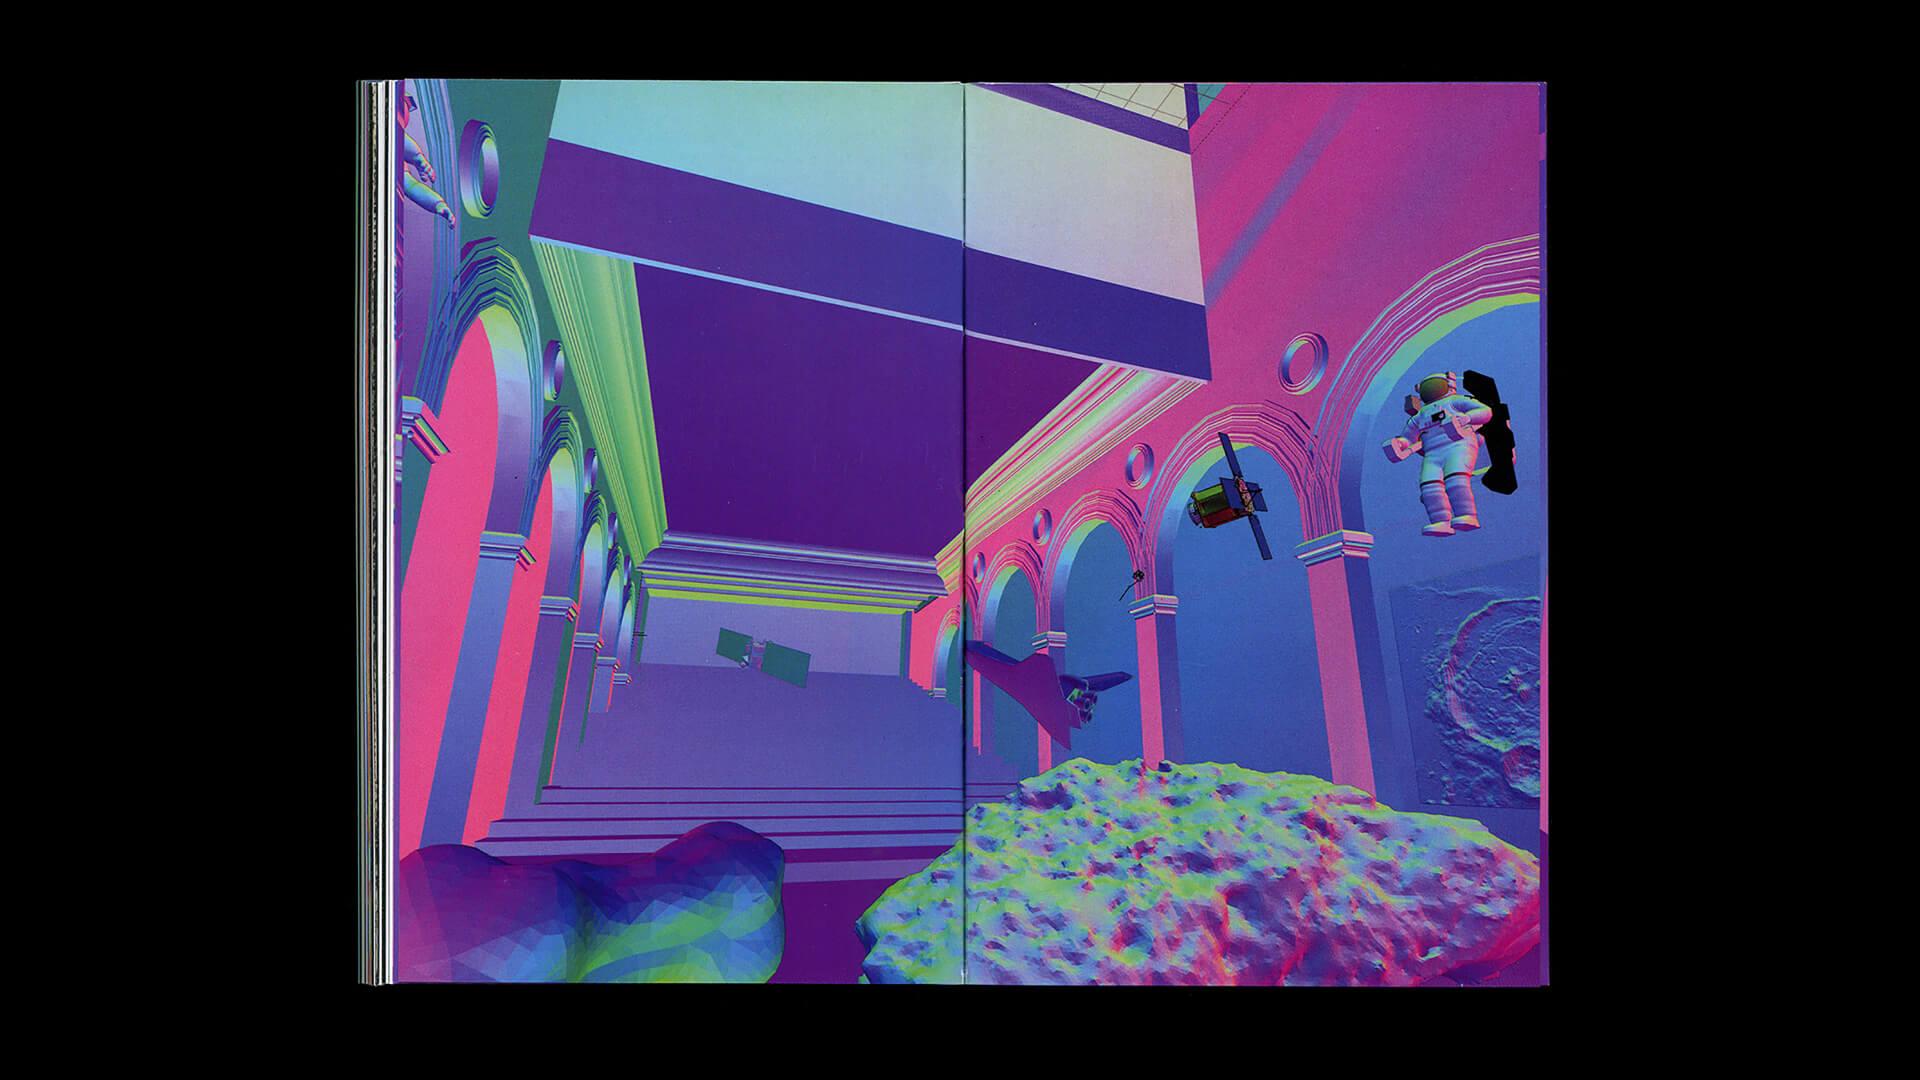 A layout from Still Life | Still Life - Mirrors And Windows - | Mario Santanilla | STIRworld